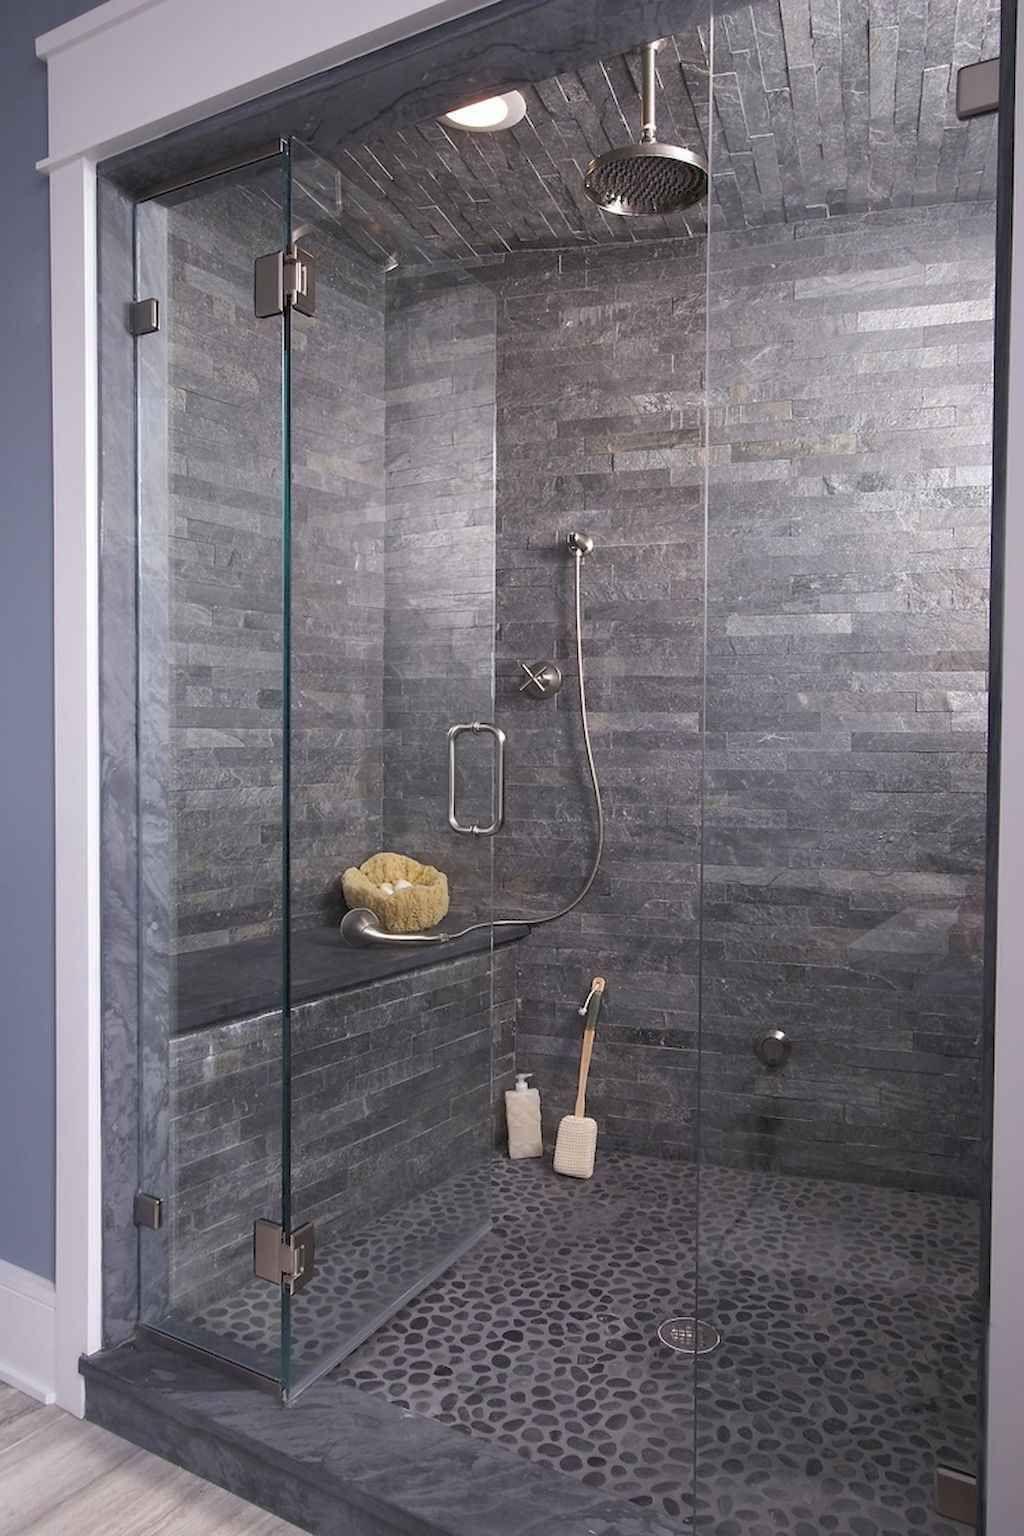 Best Bathroom Tile Ideas Beautiful Wall And Floor Tile Designs